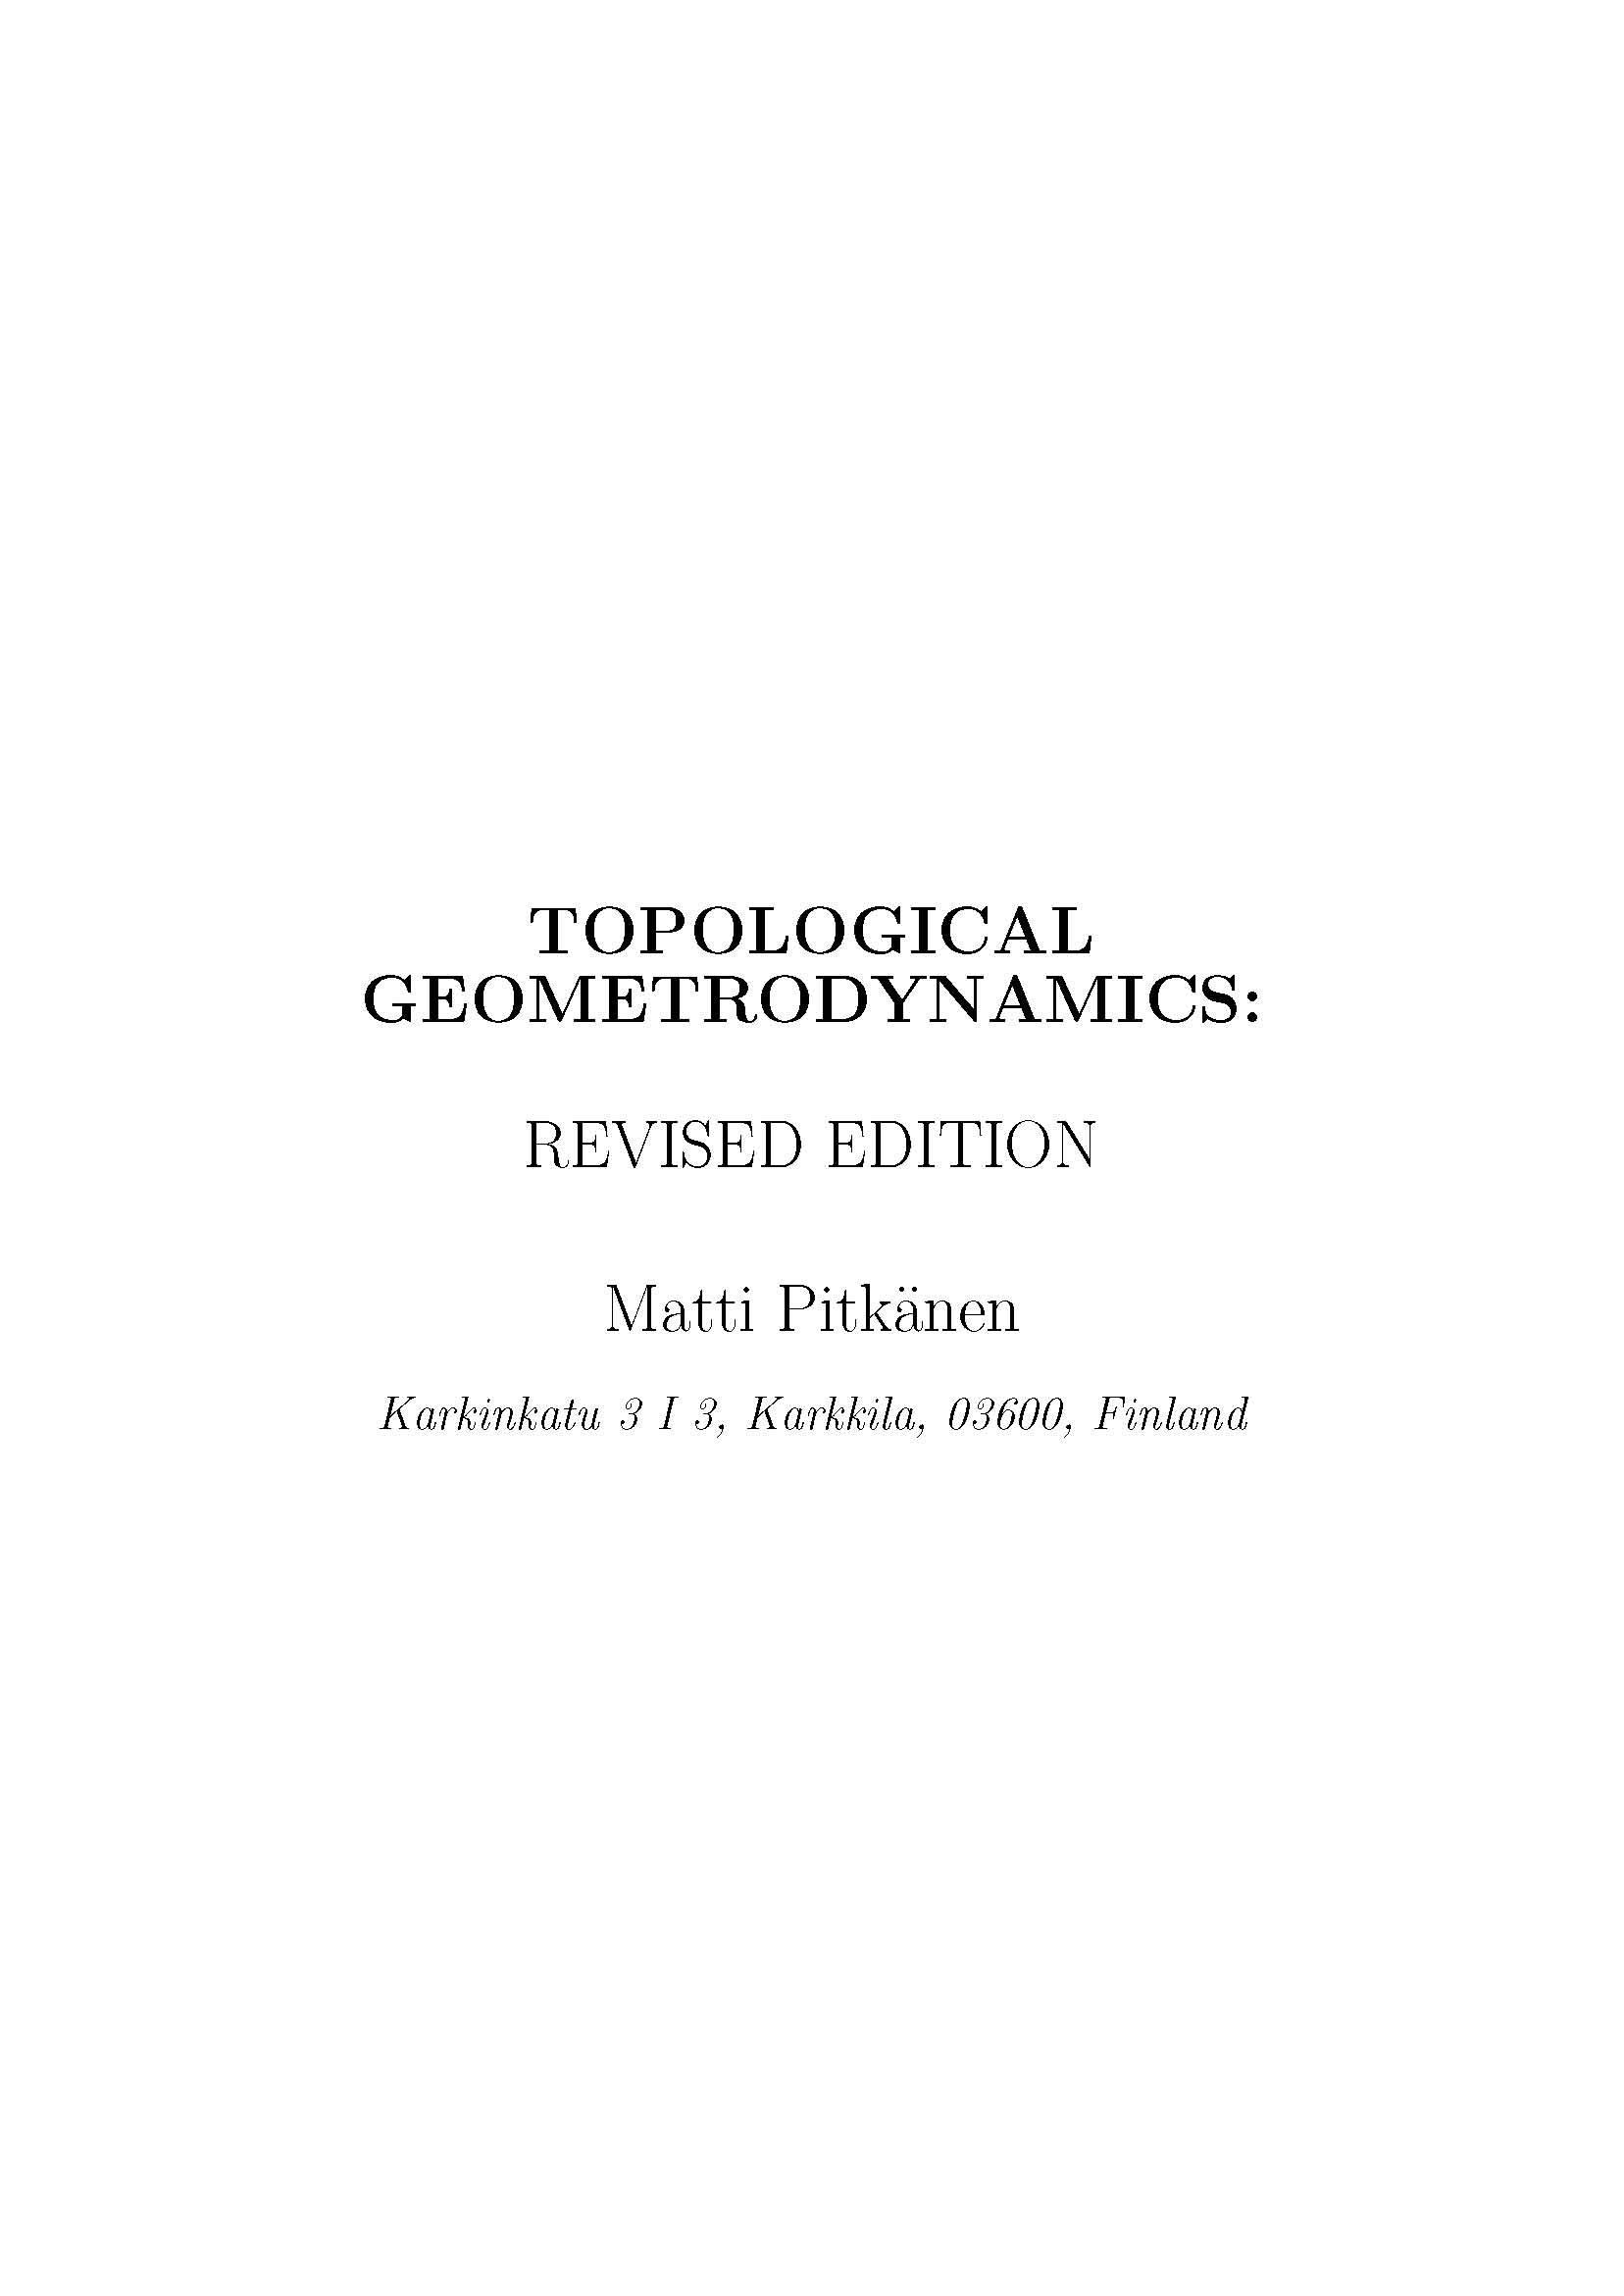 Ebooks by subject bentham ebooks bentham ebook fandeluxe Image collections